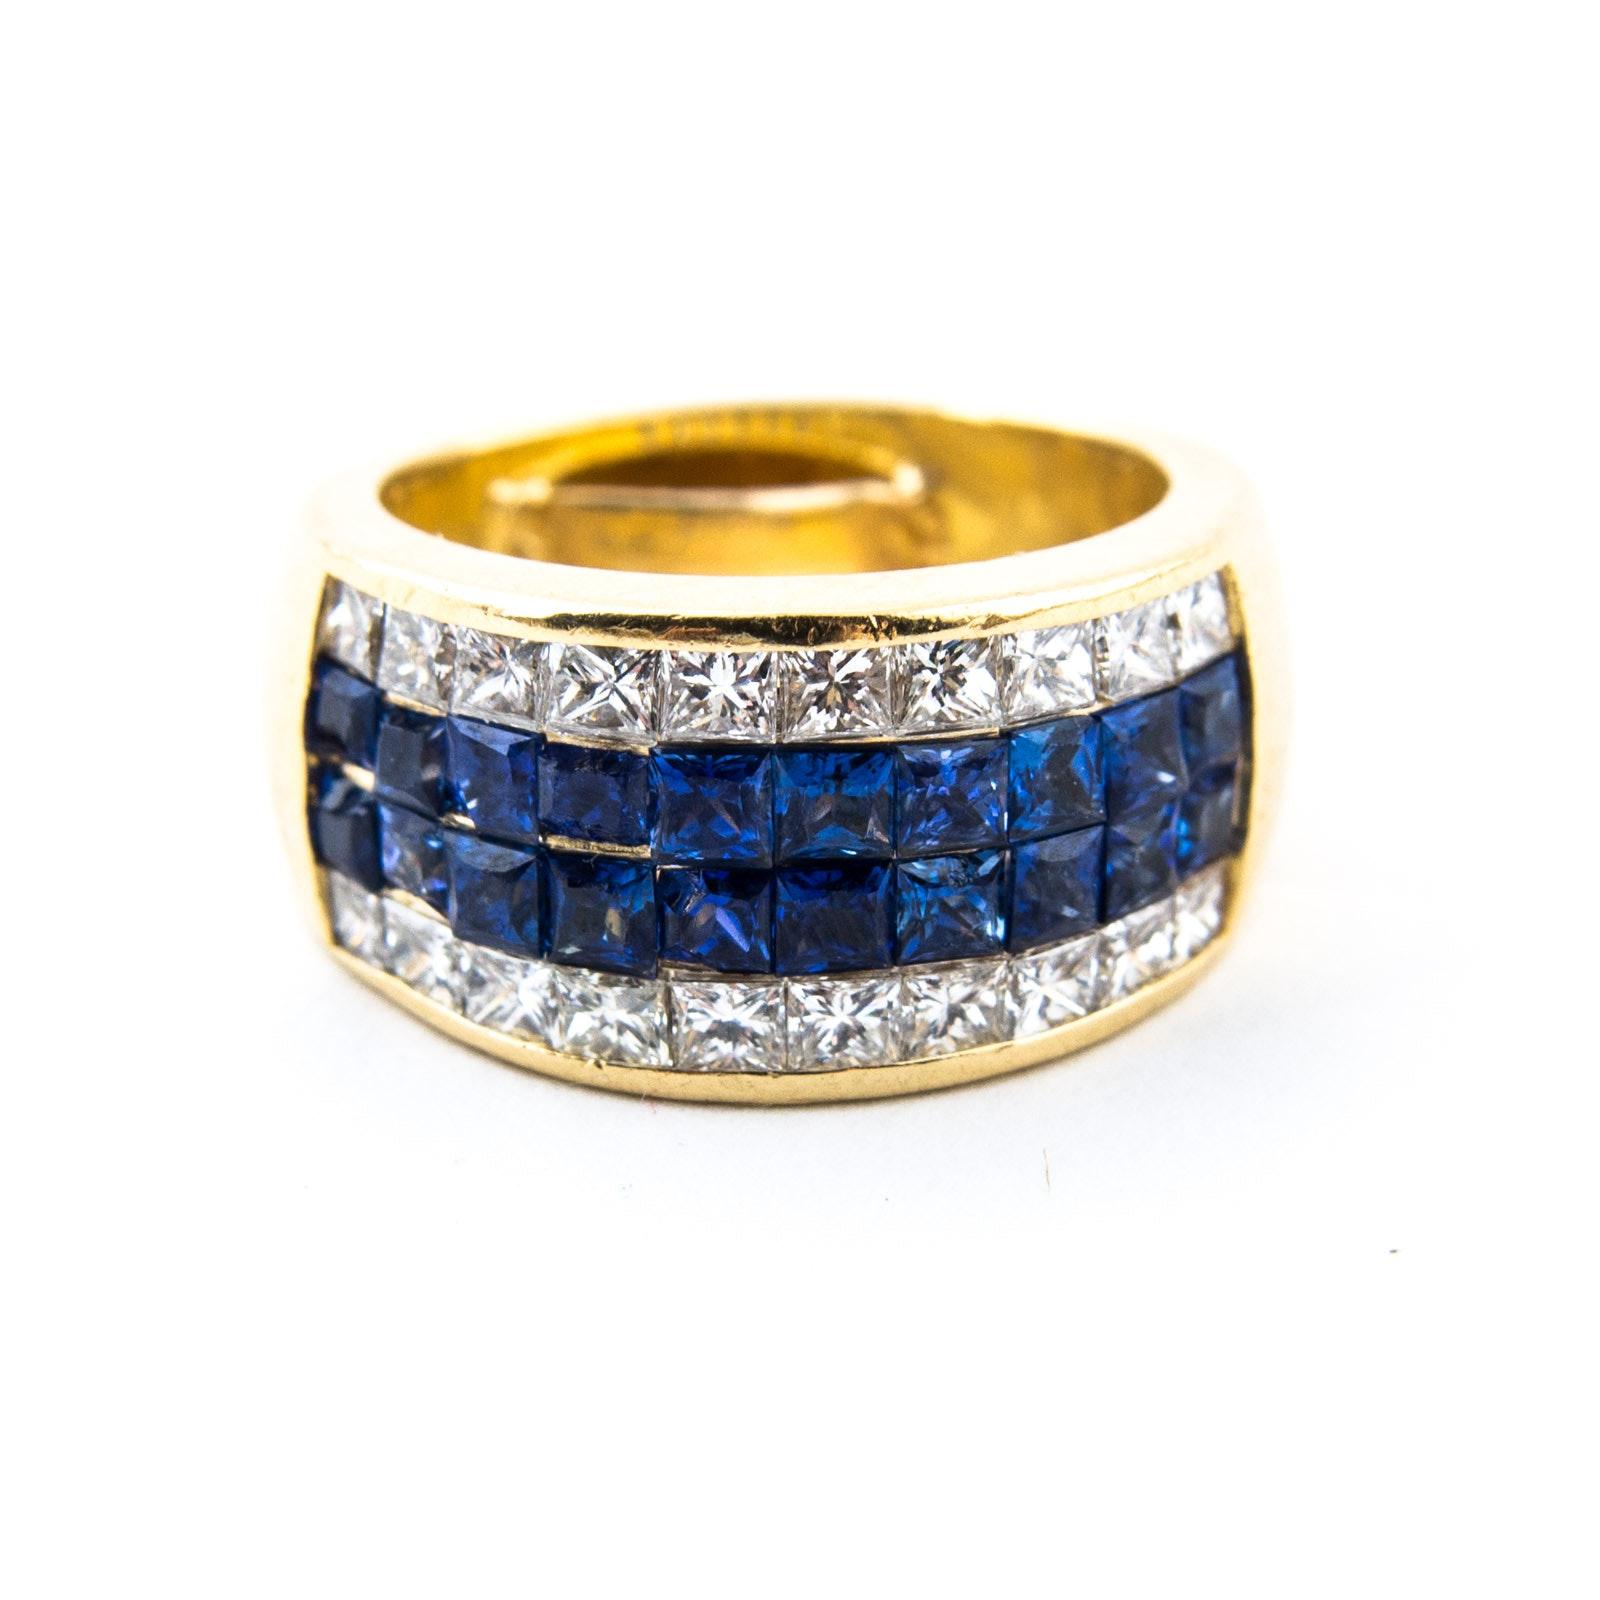 18K Yellow Gold, Blue Sapphire, and Diamond Ring